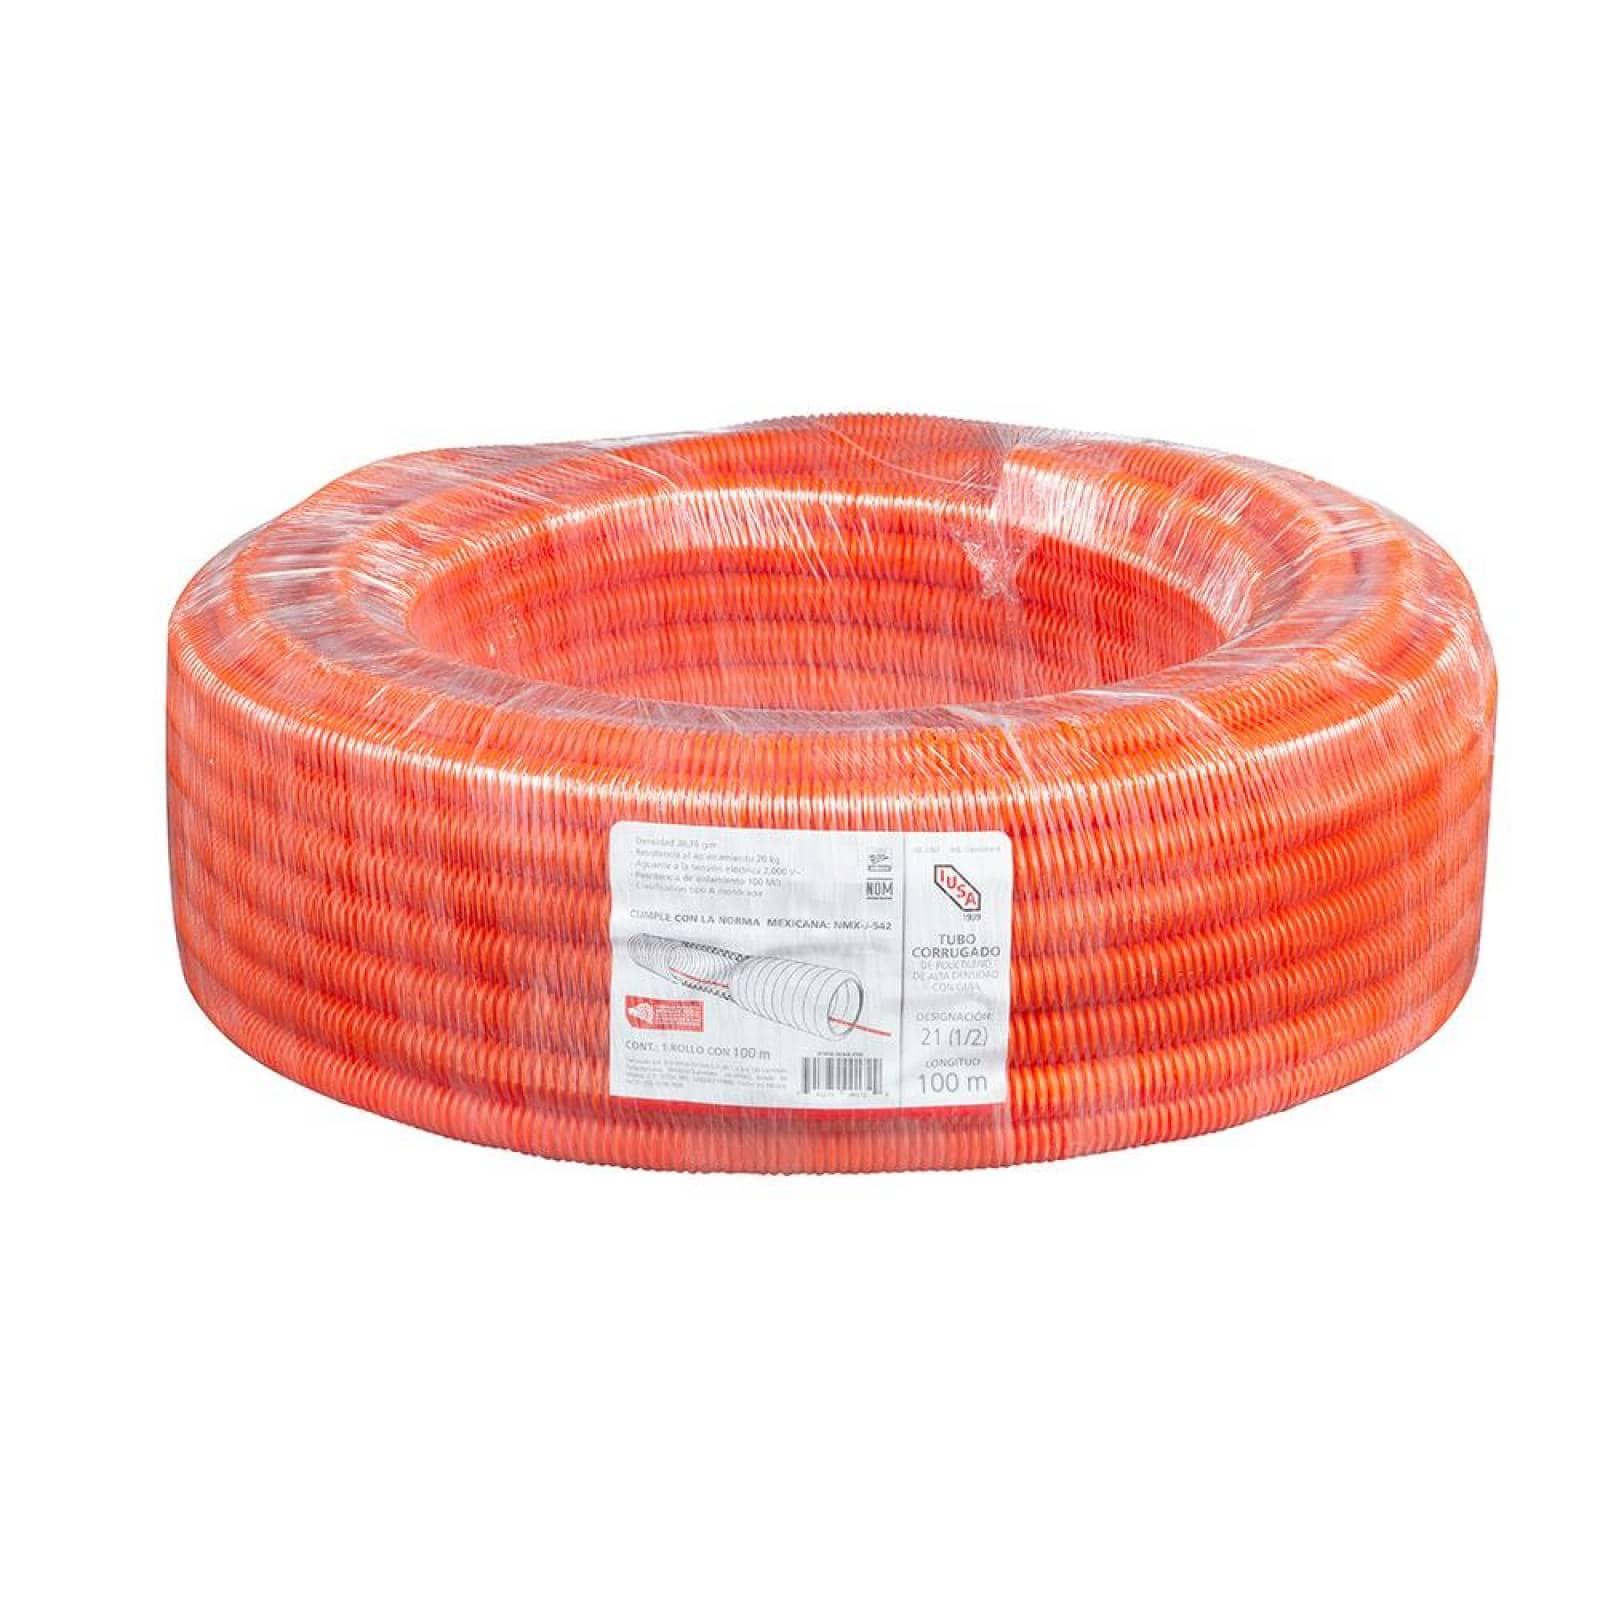 Poliducto corrugado 12 rollo 100 m